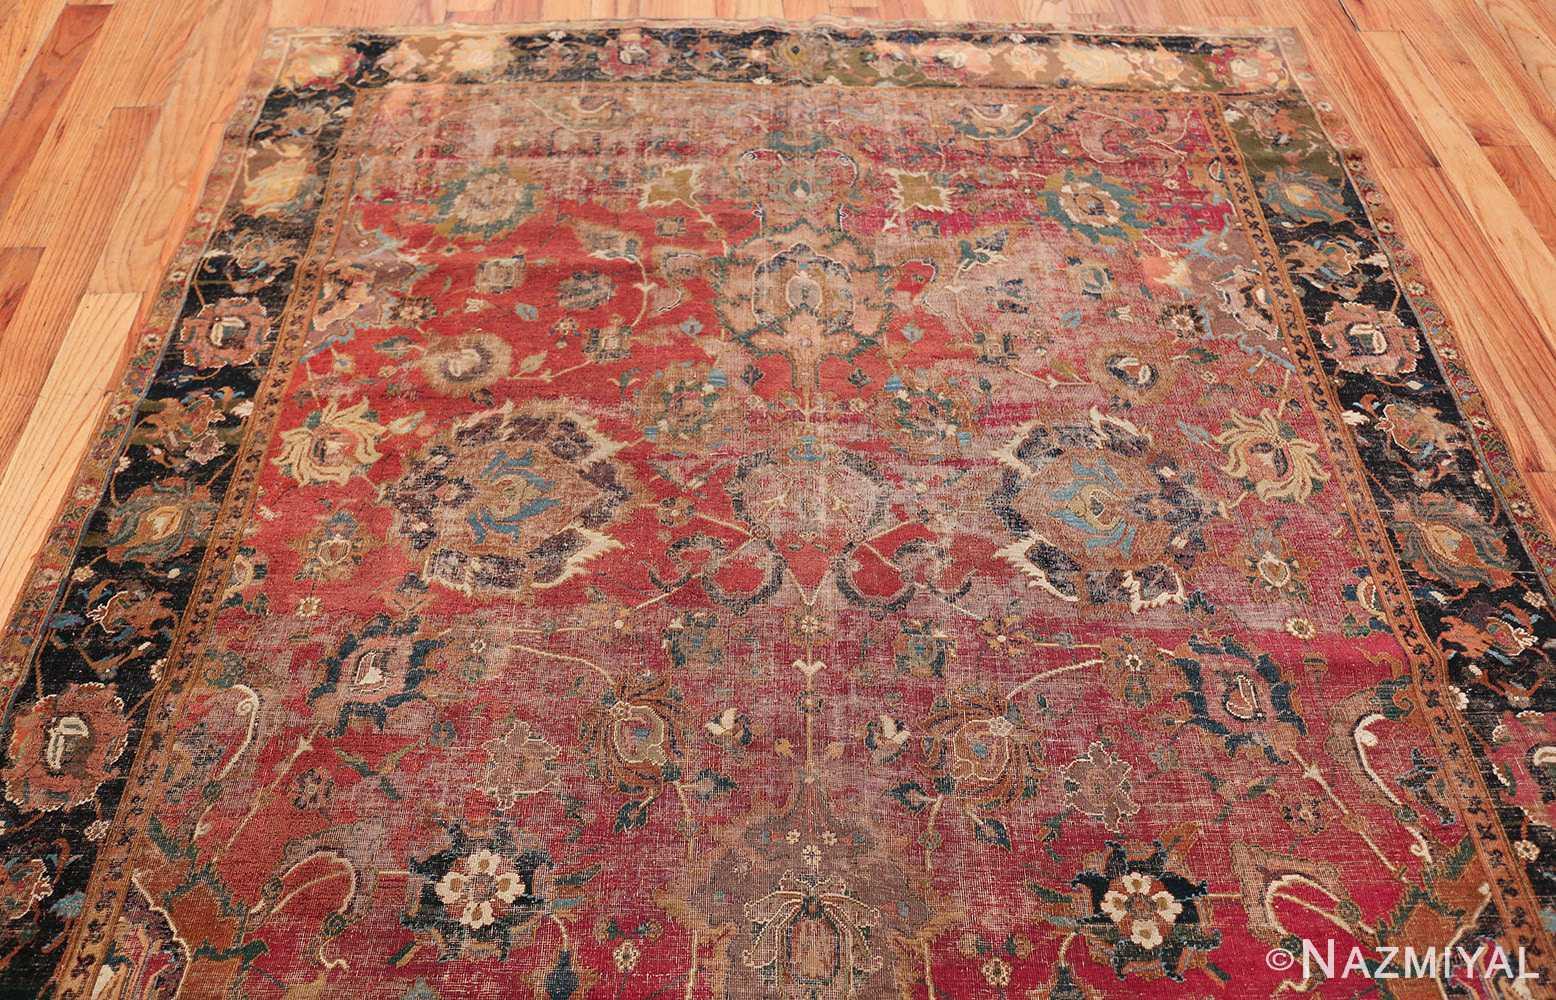 17th Century Wide Hallway Persian Isfahan Rug 49664 Top Design Pattern Nazmiyal